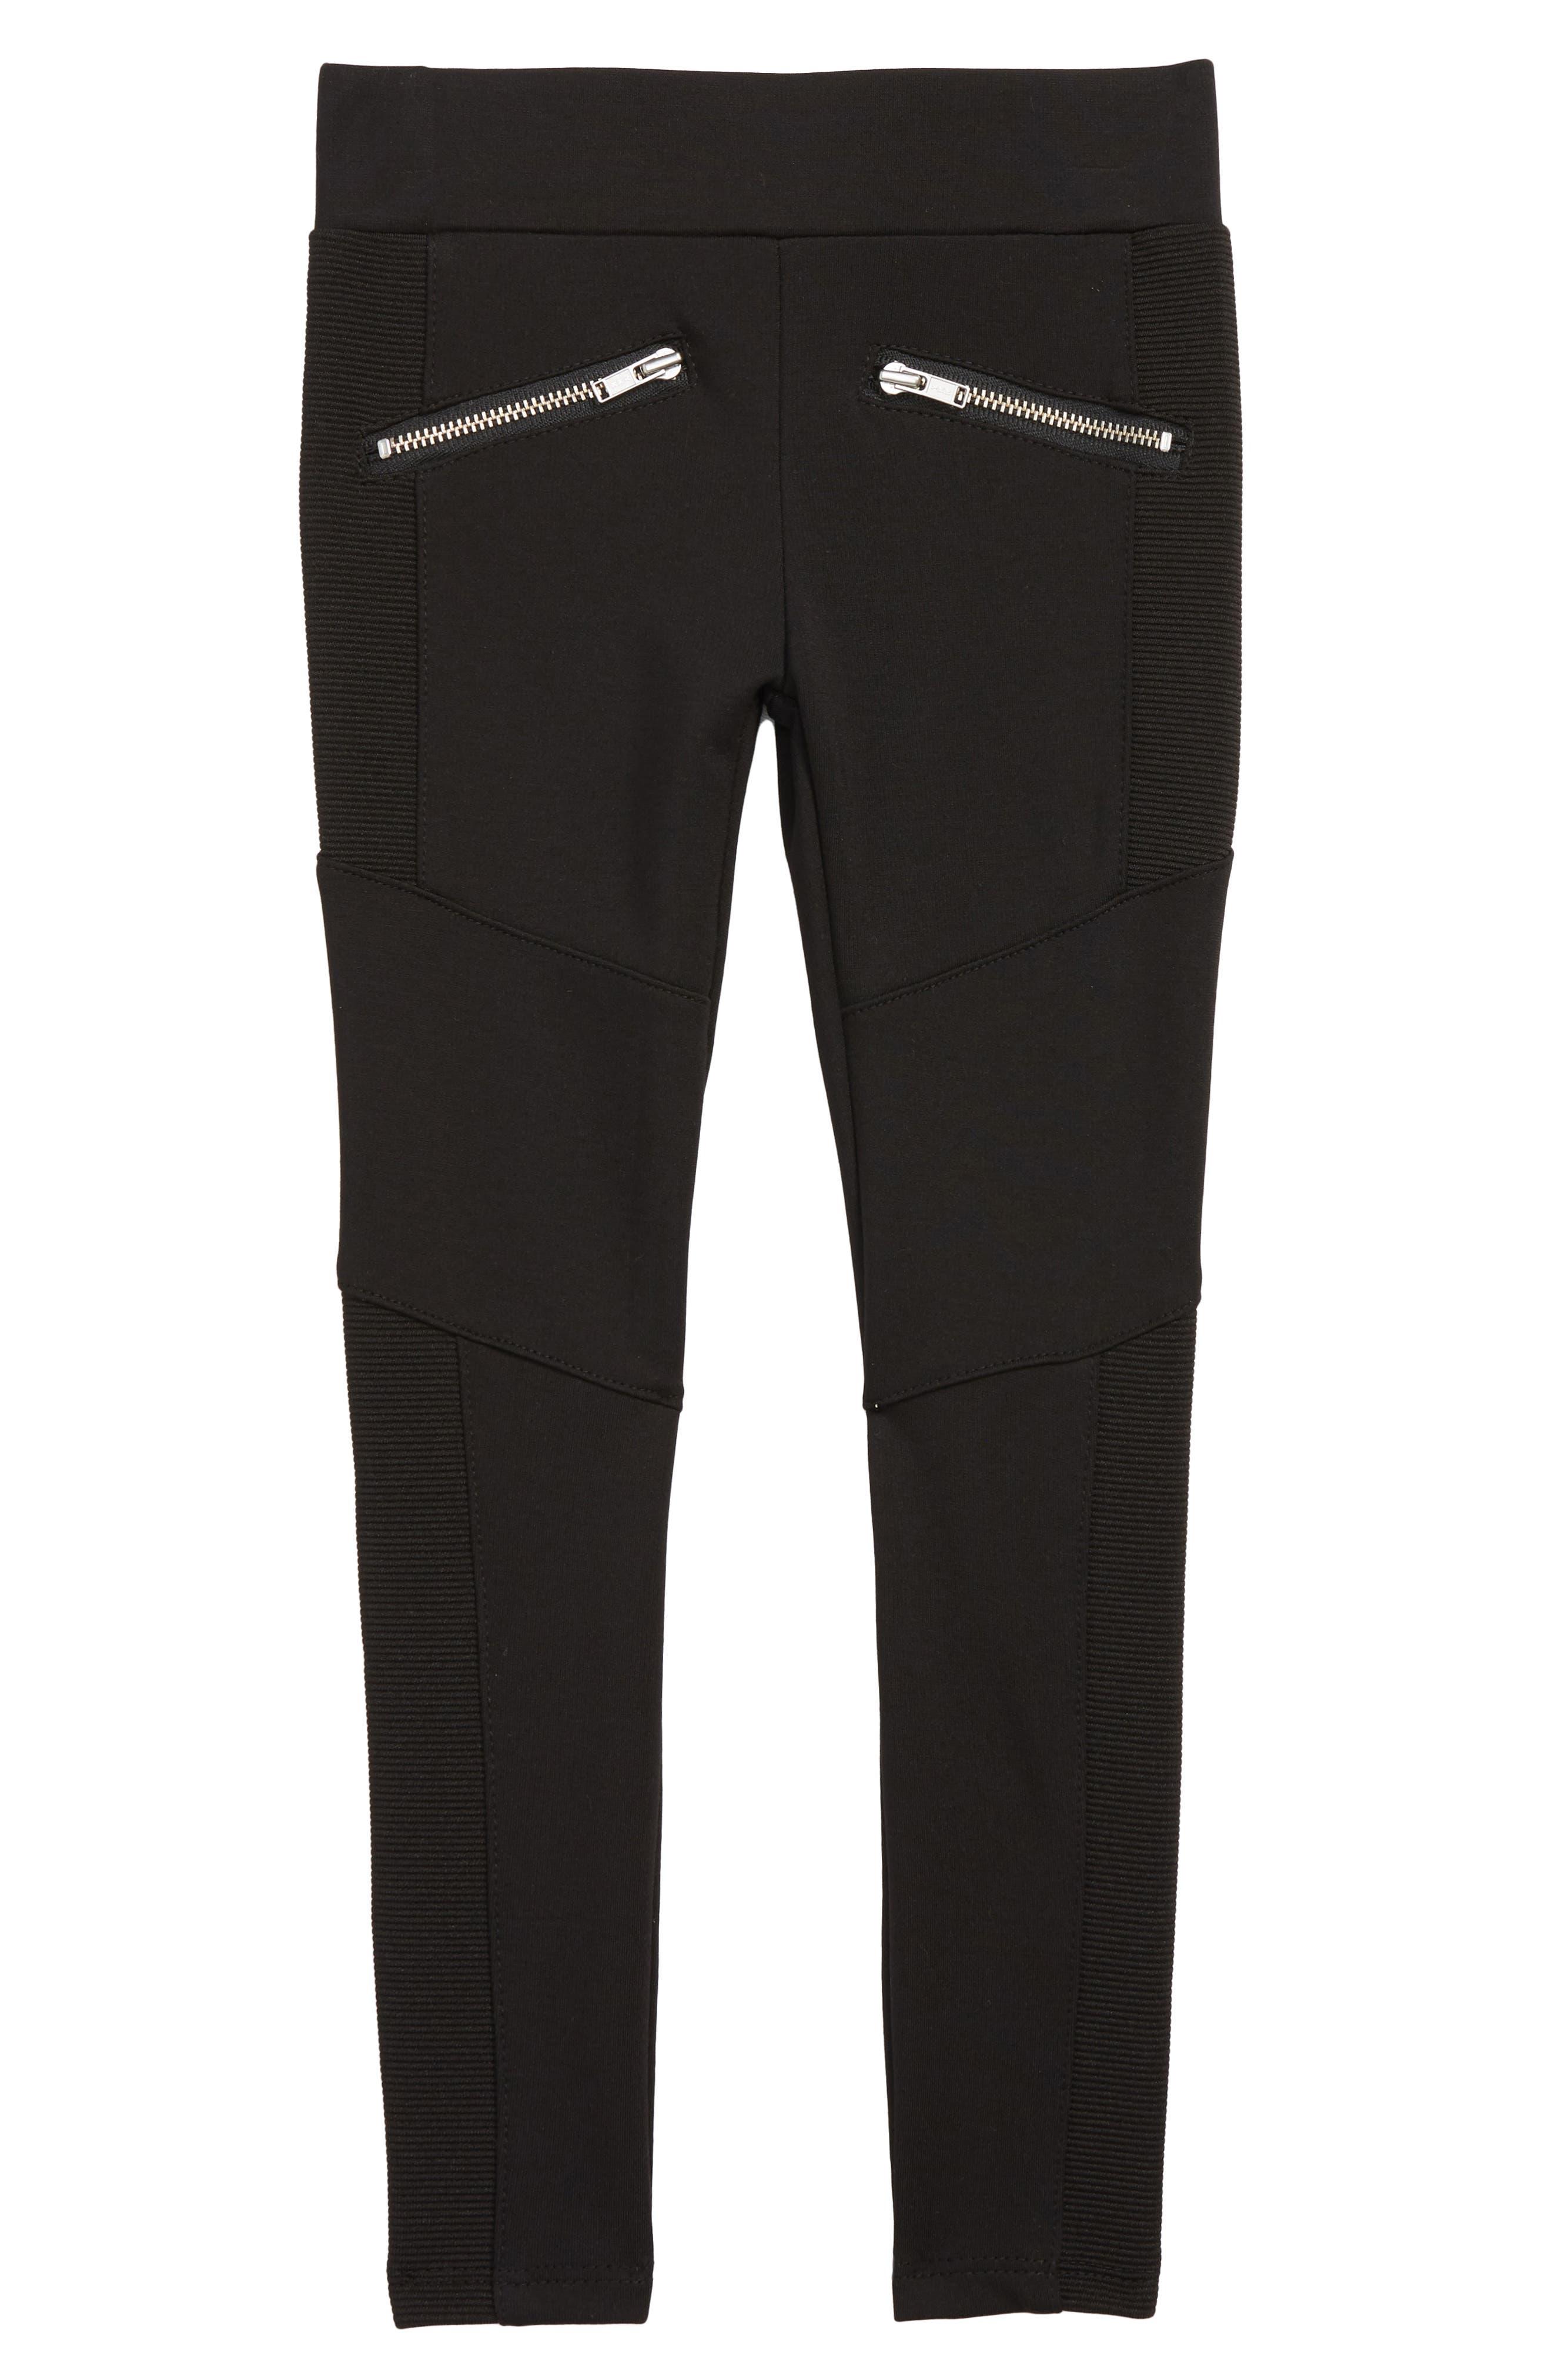 Toddler Girls Peek Emerson Elastic Waist Pants Size 3T  Black